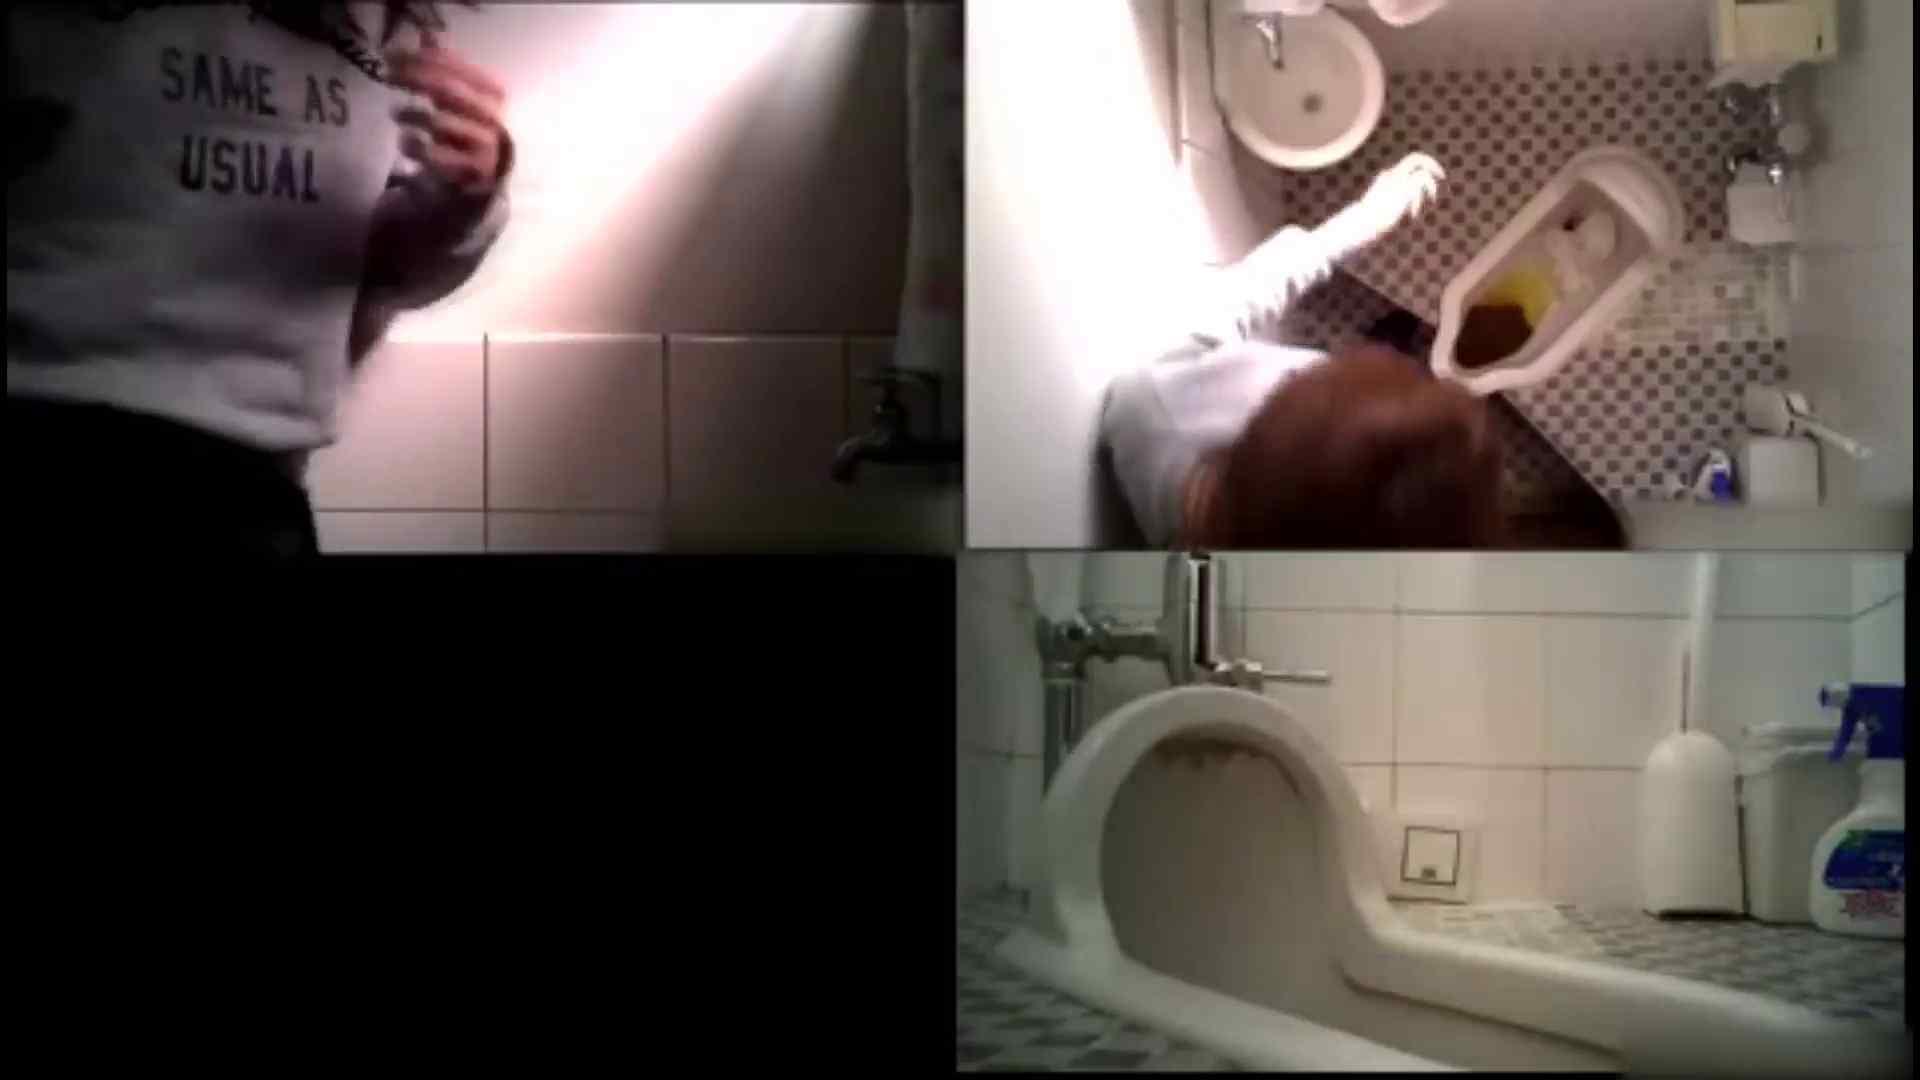 Vol.05 花の女子大生 トイレ恥態 進化系マルチアングル!! トイレ中   女子大生達のヌード  38連発 24